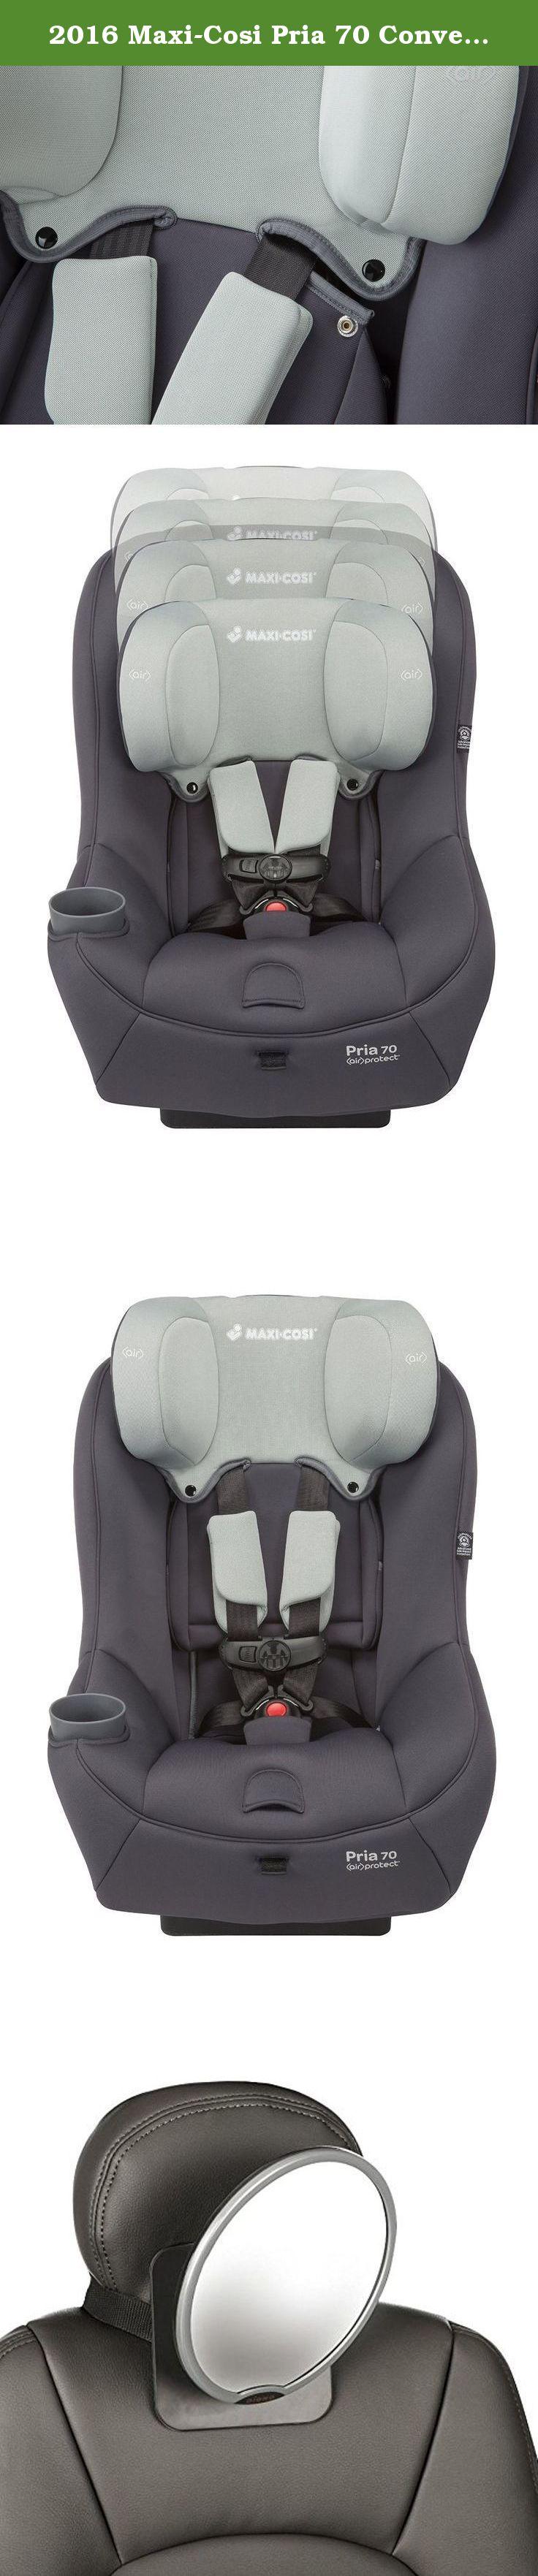 2016 Maxi Cosi Pria 70 Convertible Car Seat Mineral Grey With Back Mirror